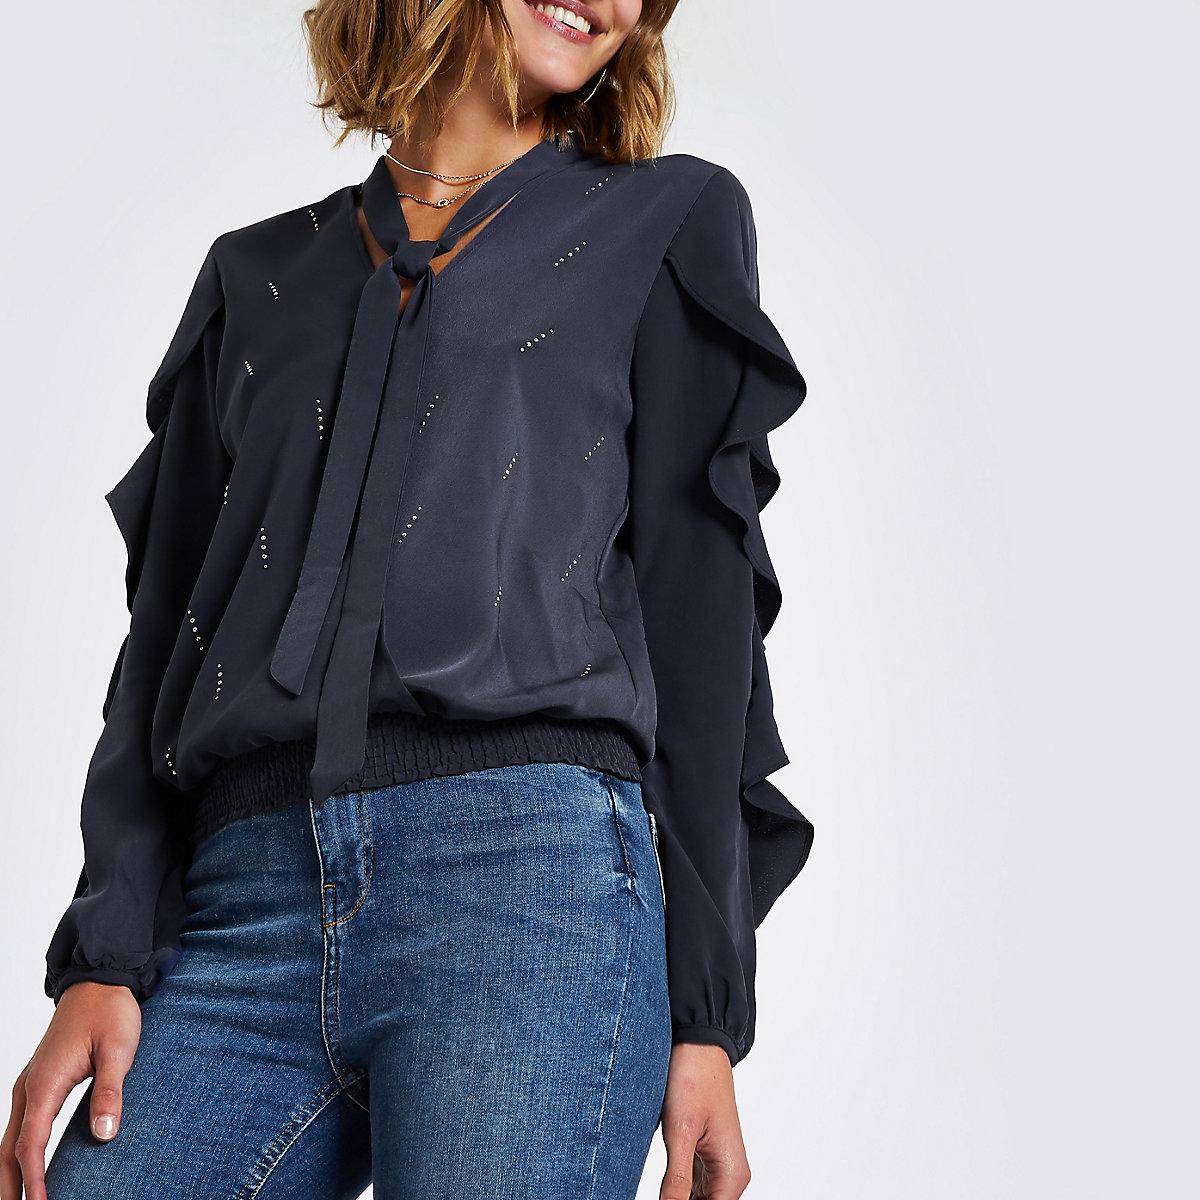 Navy rhinestone heatseal frill sleeve blouse